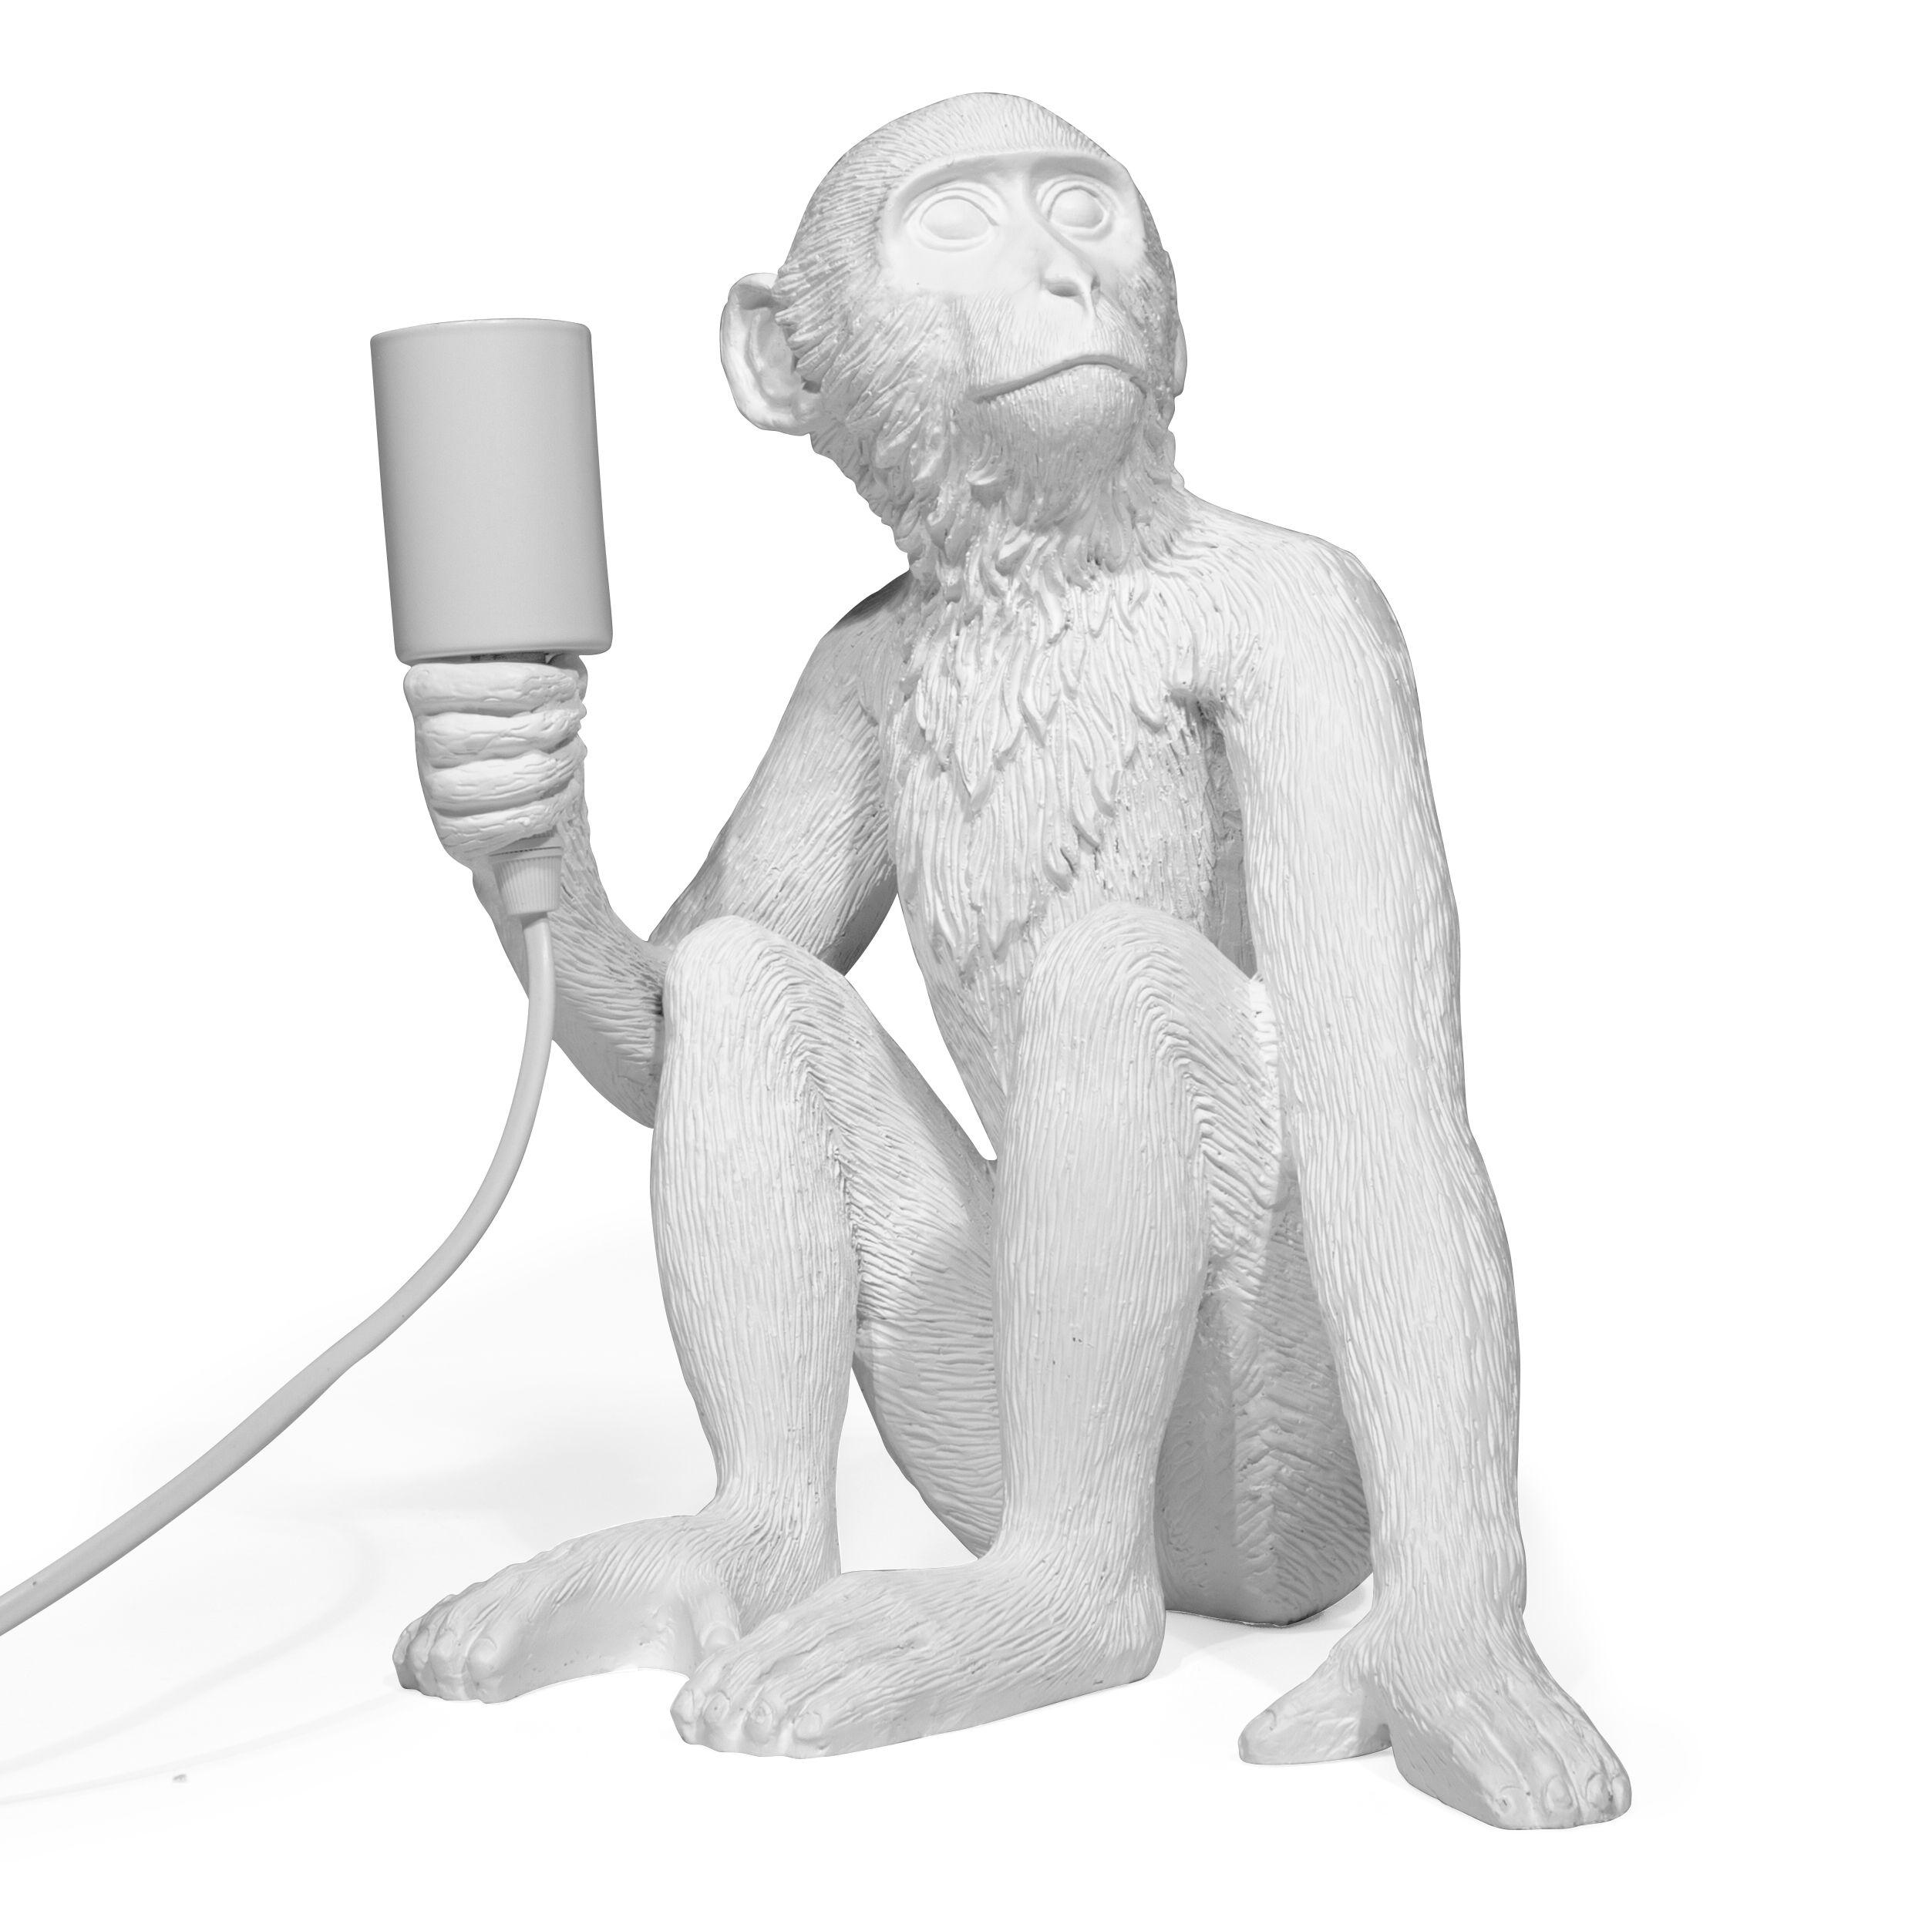 Lamp Aap - Zittend - Wit - LiL Design